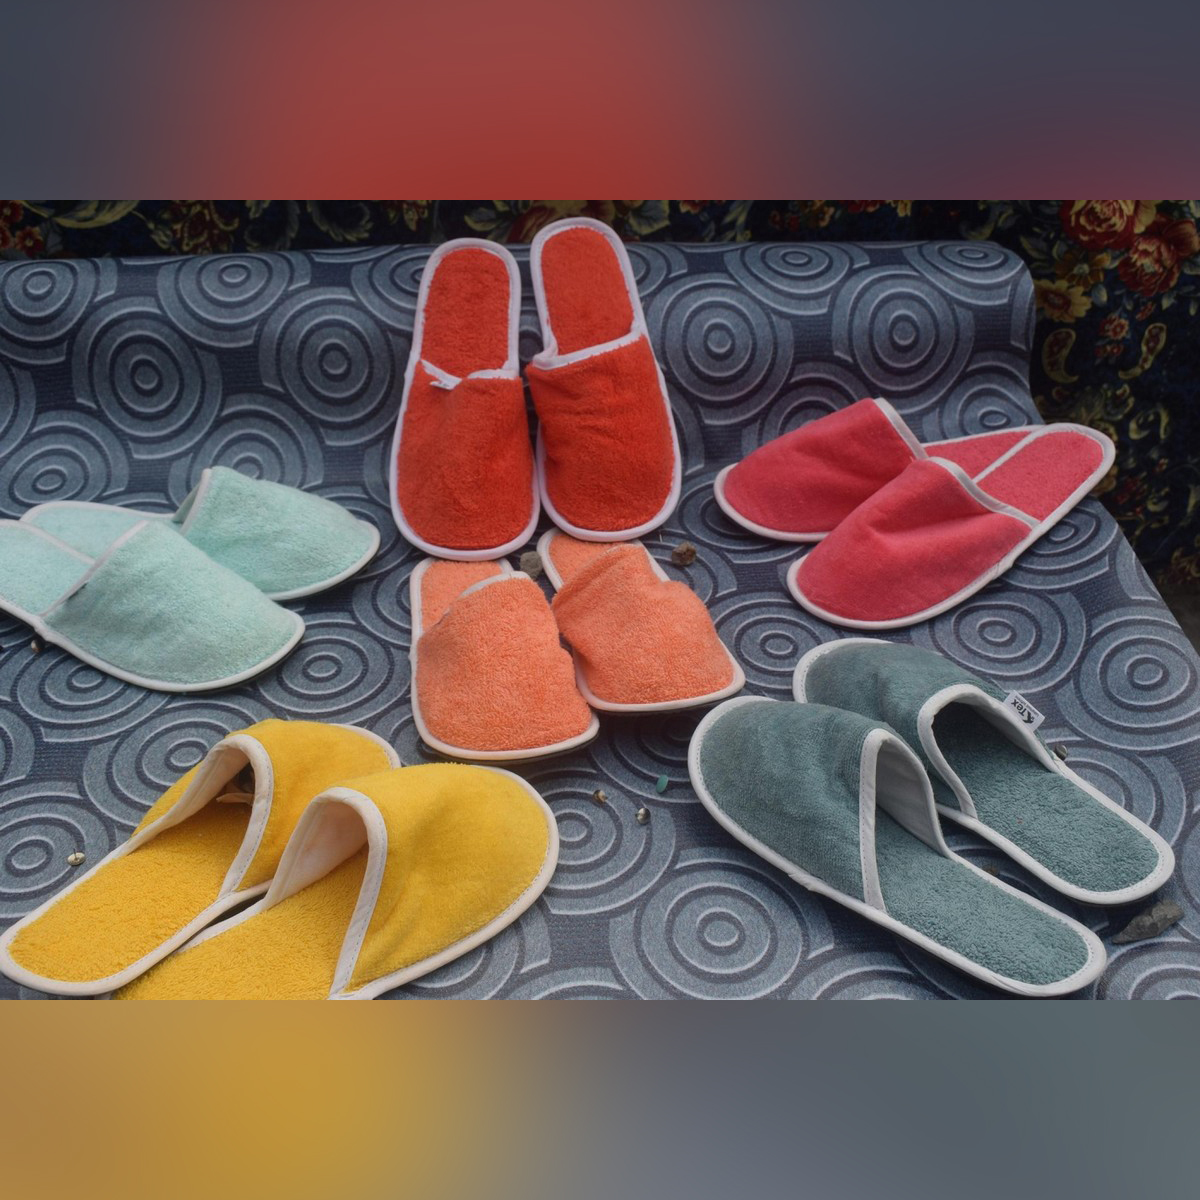 New High Quality Women Home Anti-slip Plush Slipper Winter Warm Cotton House Indoor Slipper